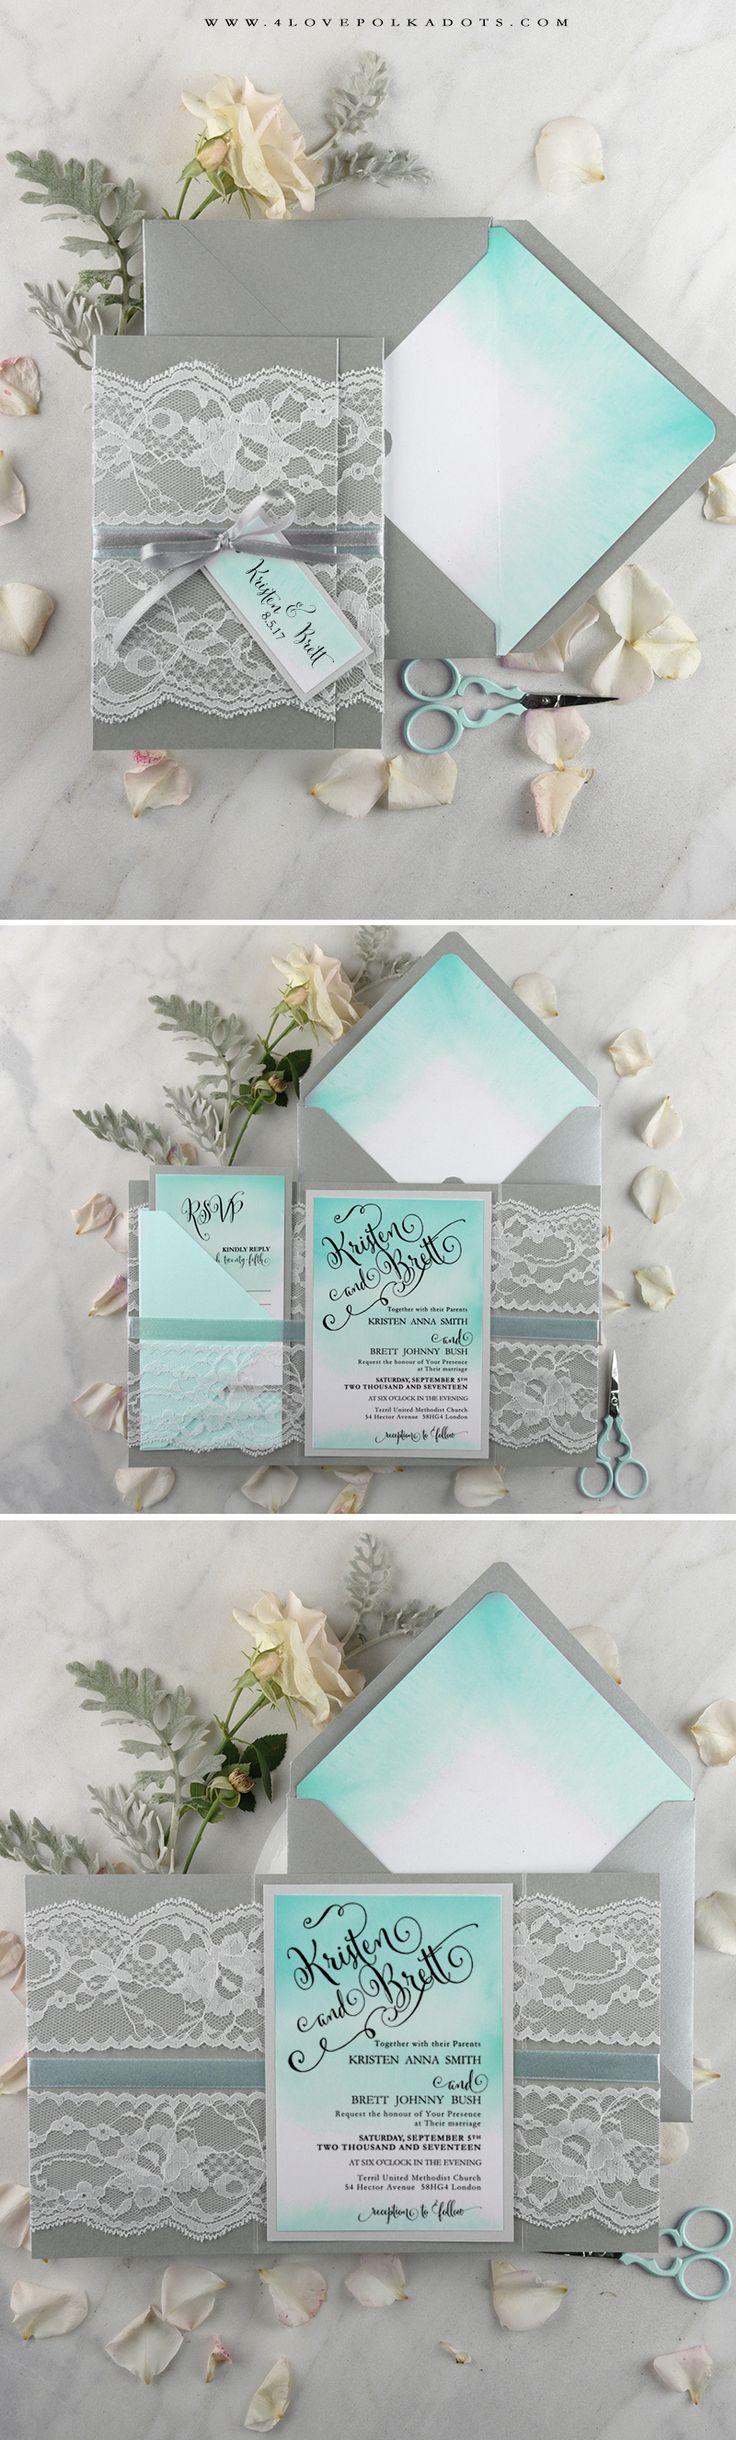 Ombre Wedding Invitation with lace #handmade #weddingideas #summerwedding